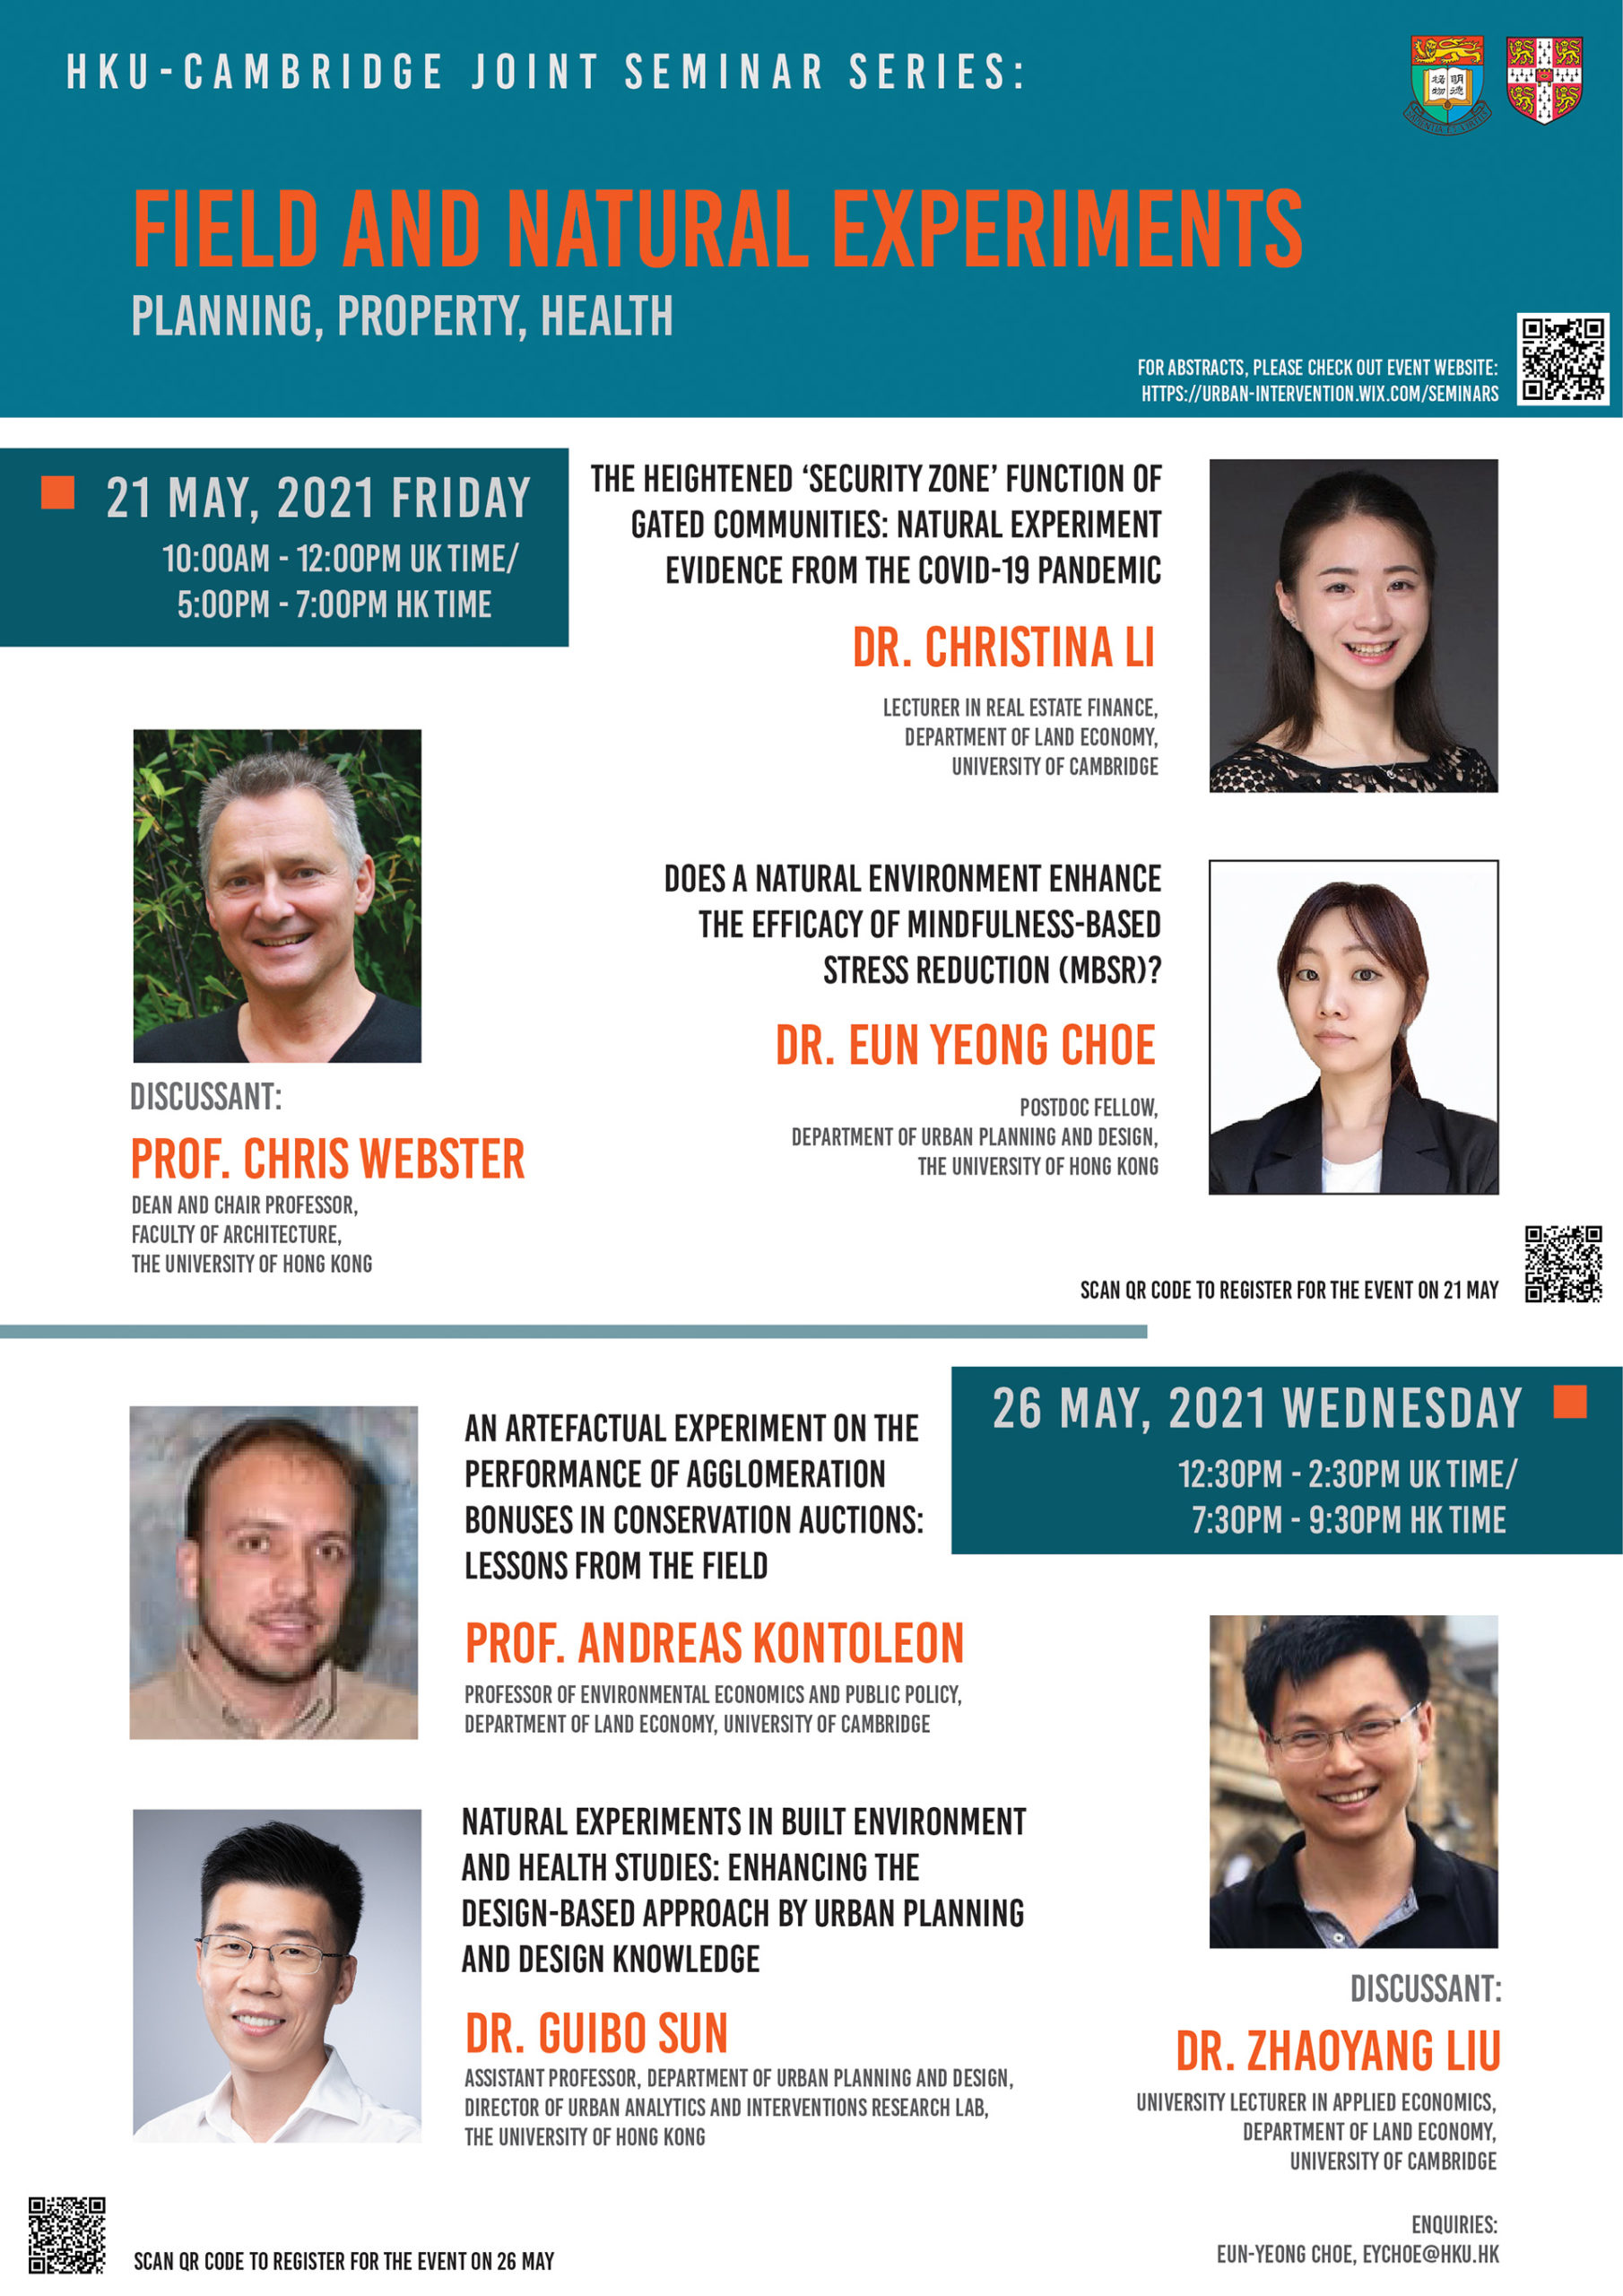 HKU-Cambridge Joint Seminar Series